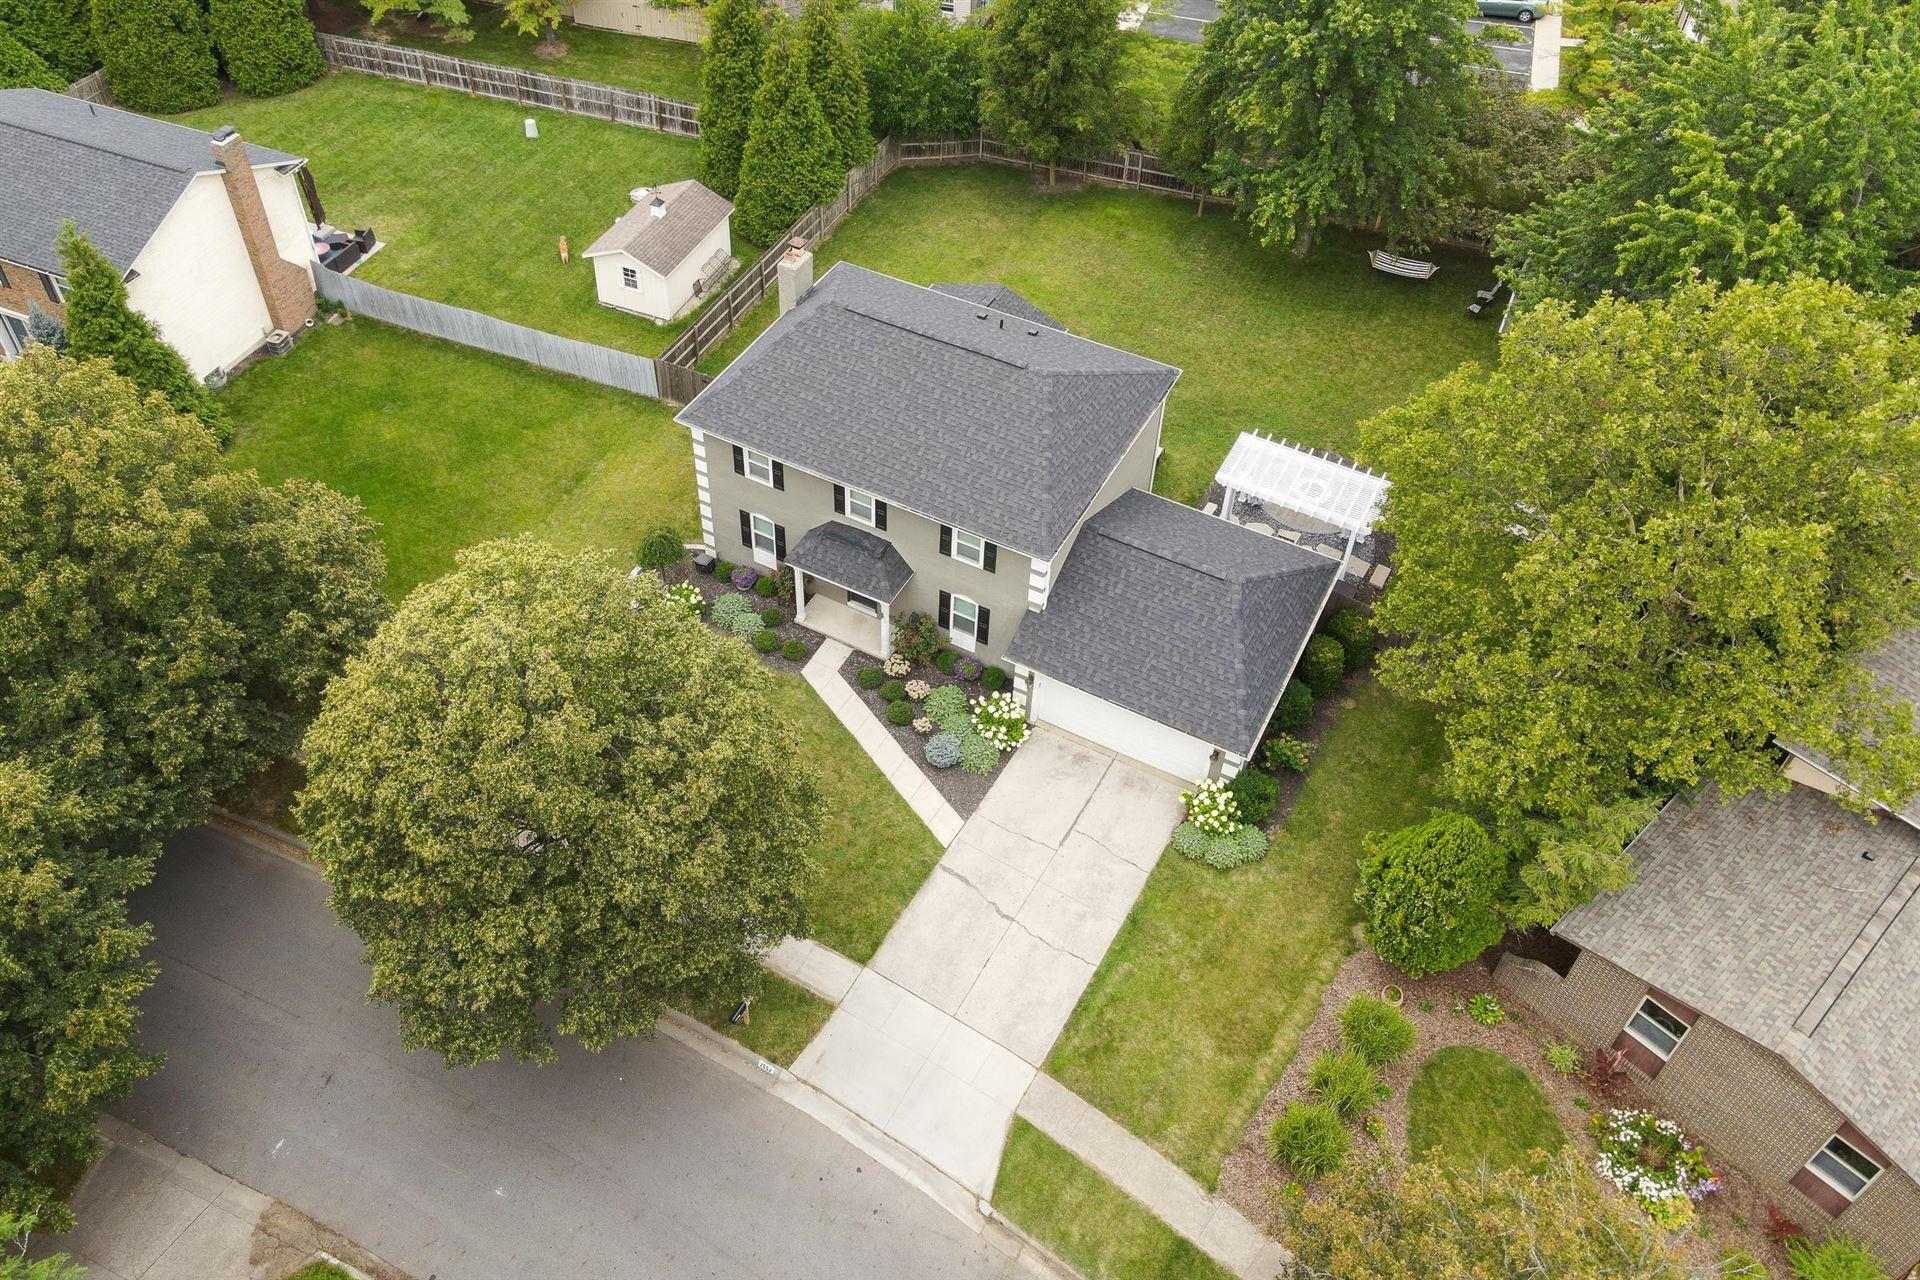 Photo of 2552 Slateshire Drive, Dublin, OH 43016 (MLS # 221028092)